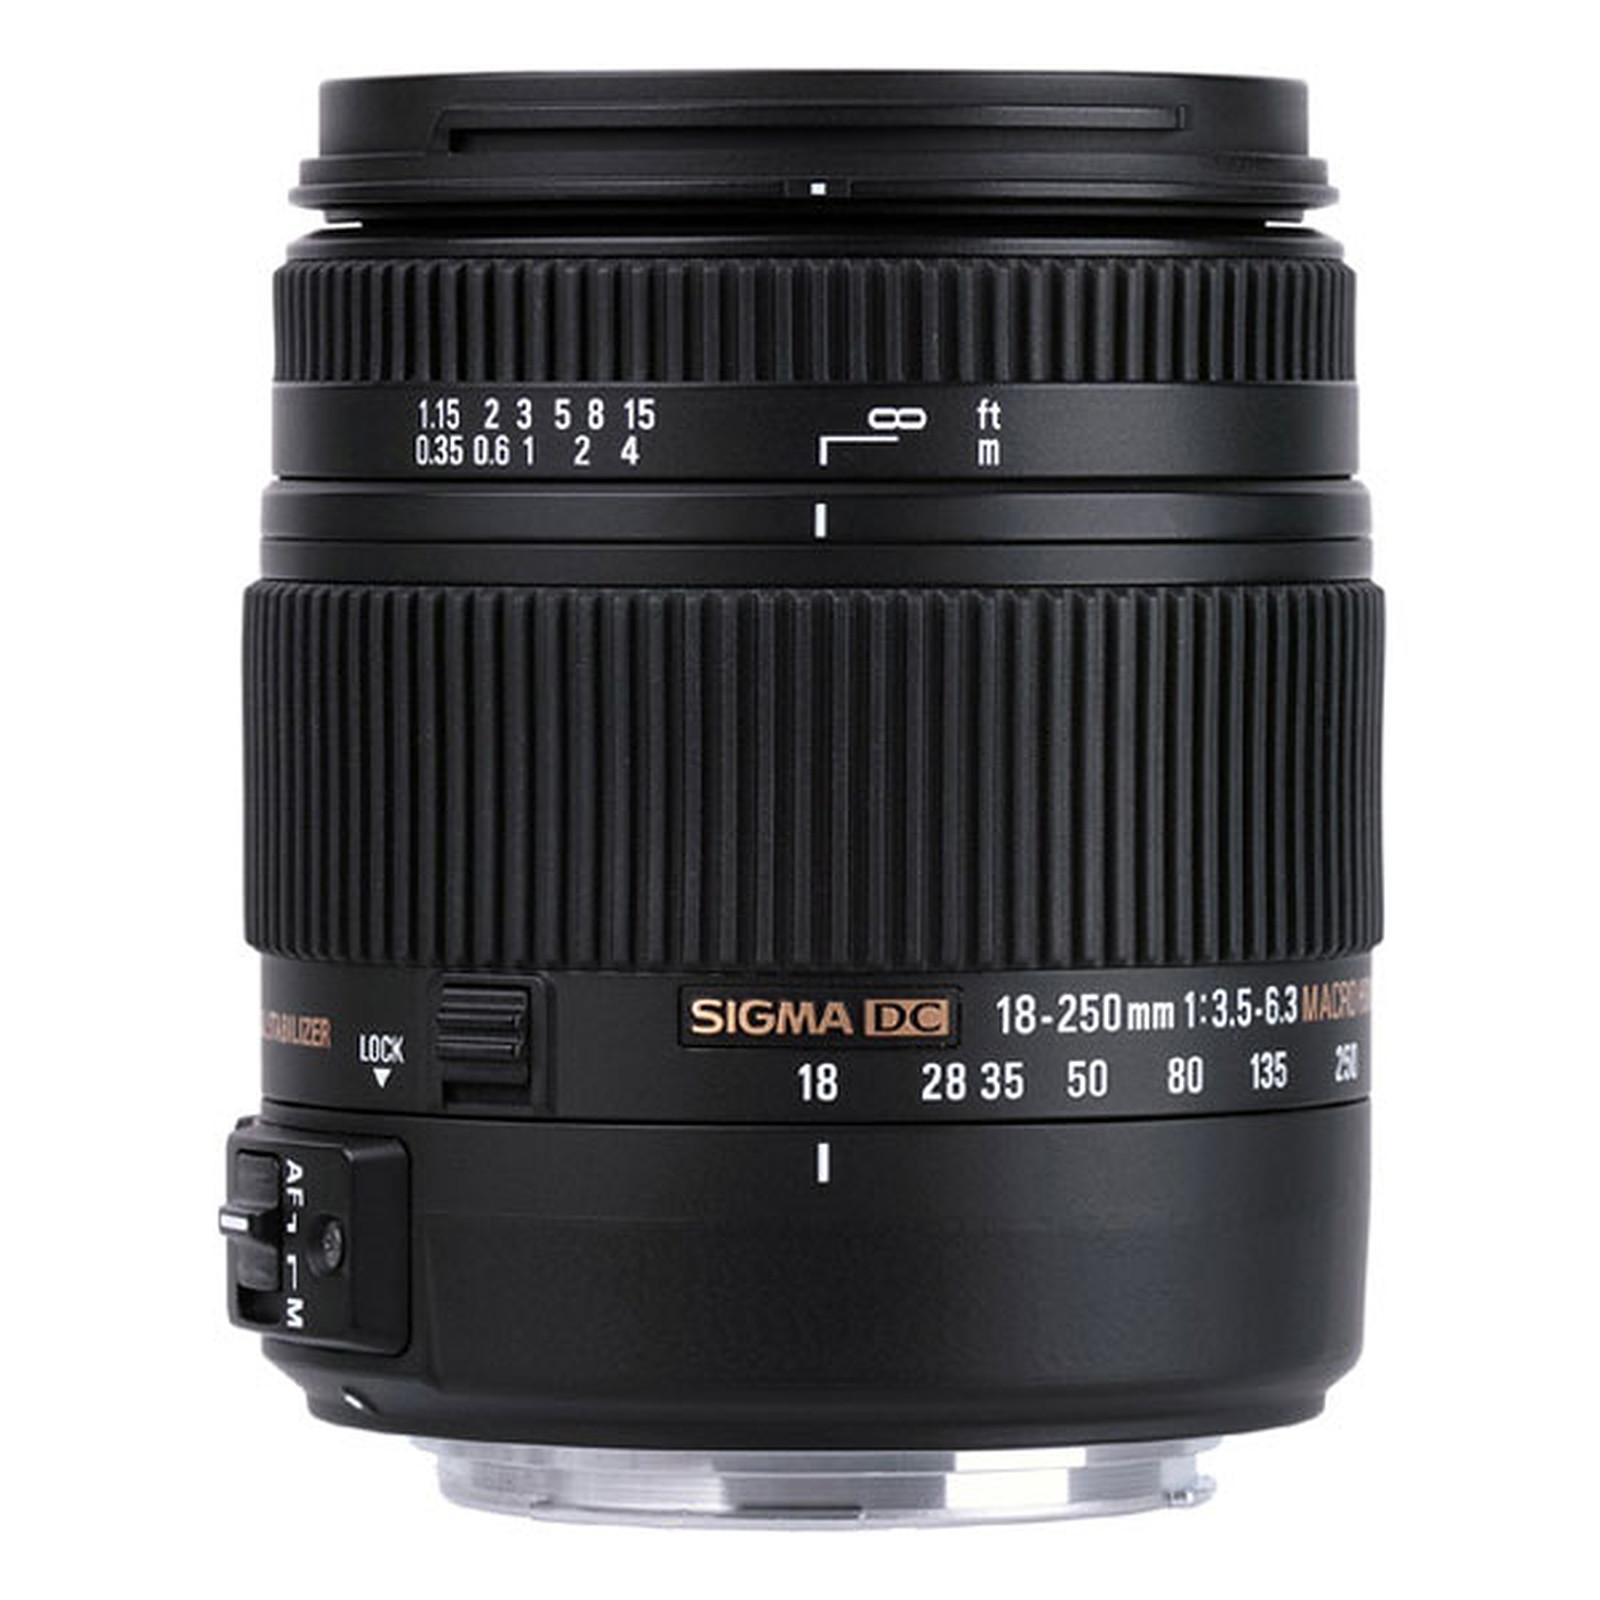 Sigma 18-250mm F3,5-6,3 DC Macro OS HSM monture Canon